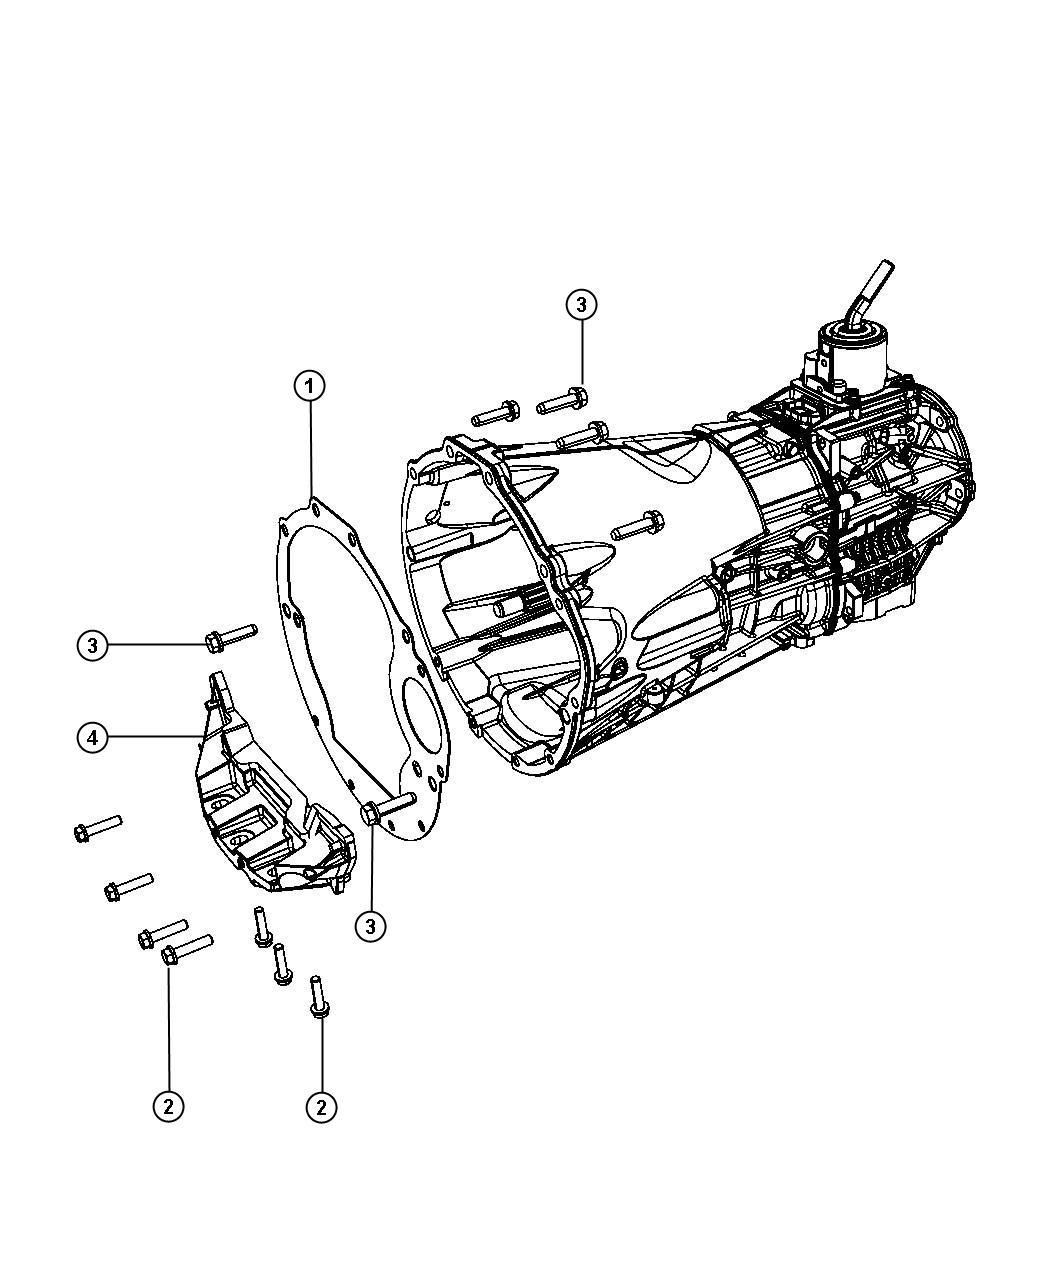 Jeep Wrangler Shield Spacer Clutch Housing Dust Dust